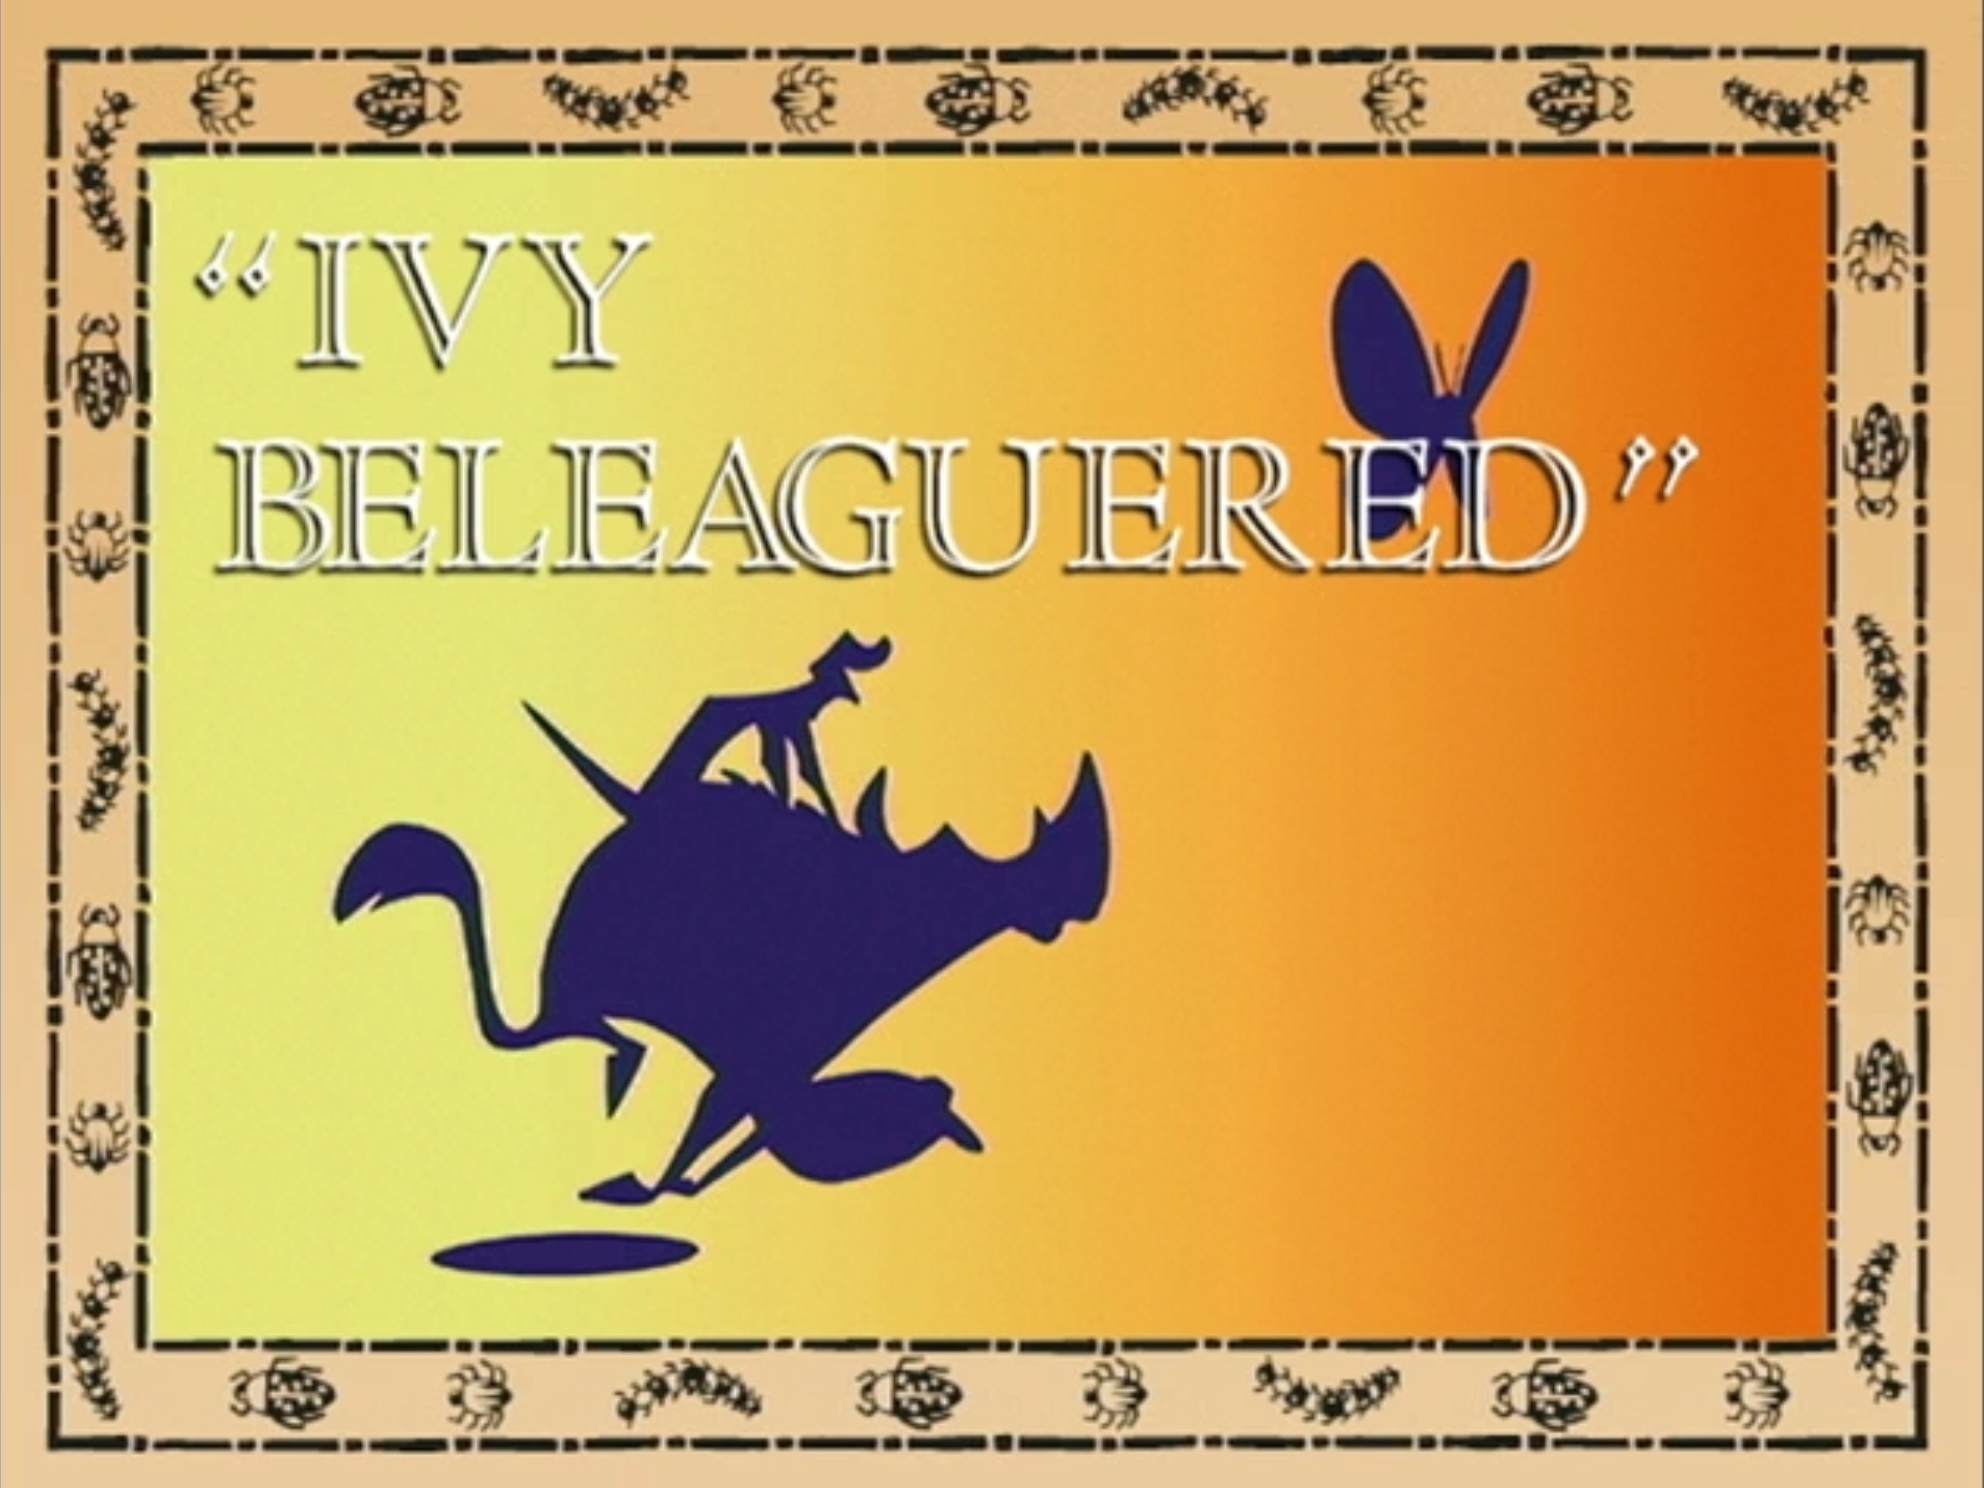 Ivy Beleaguered